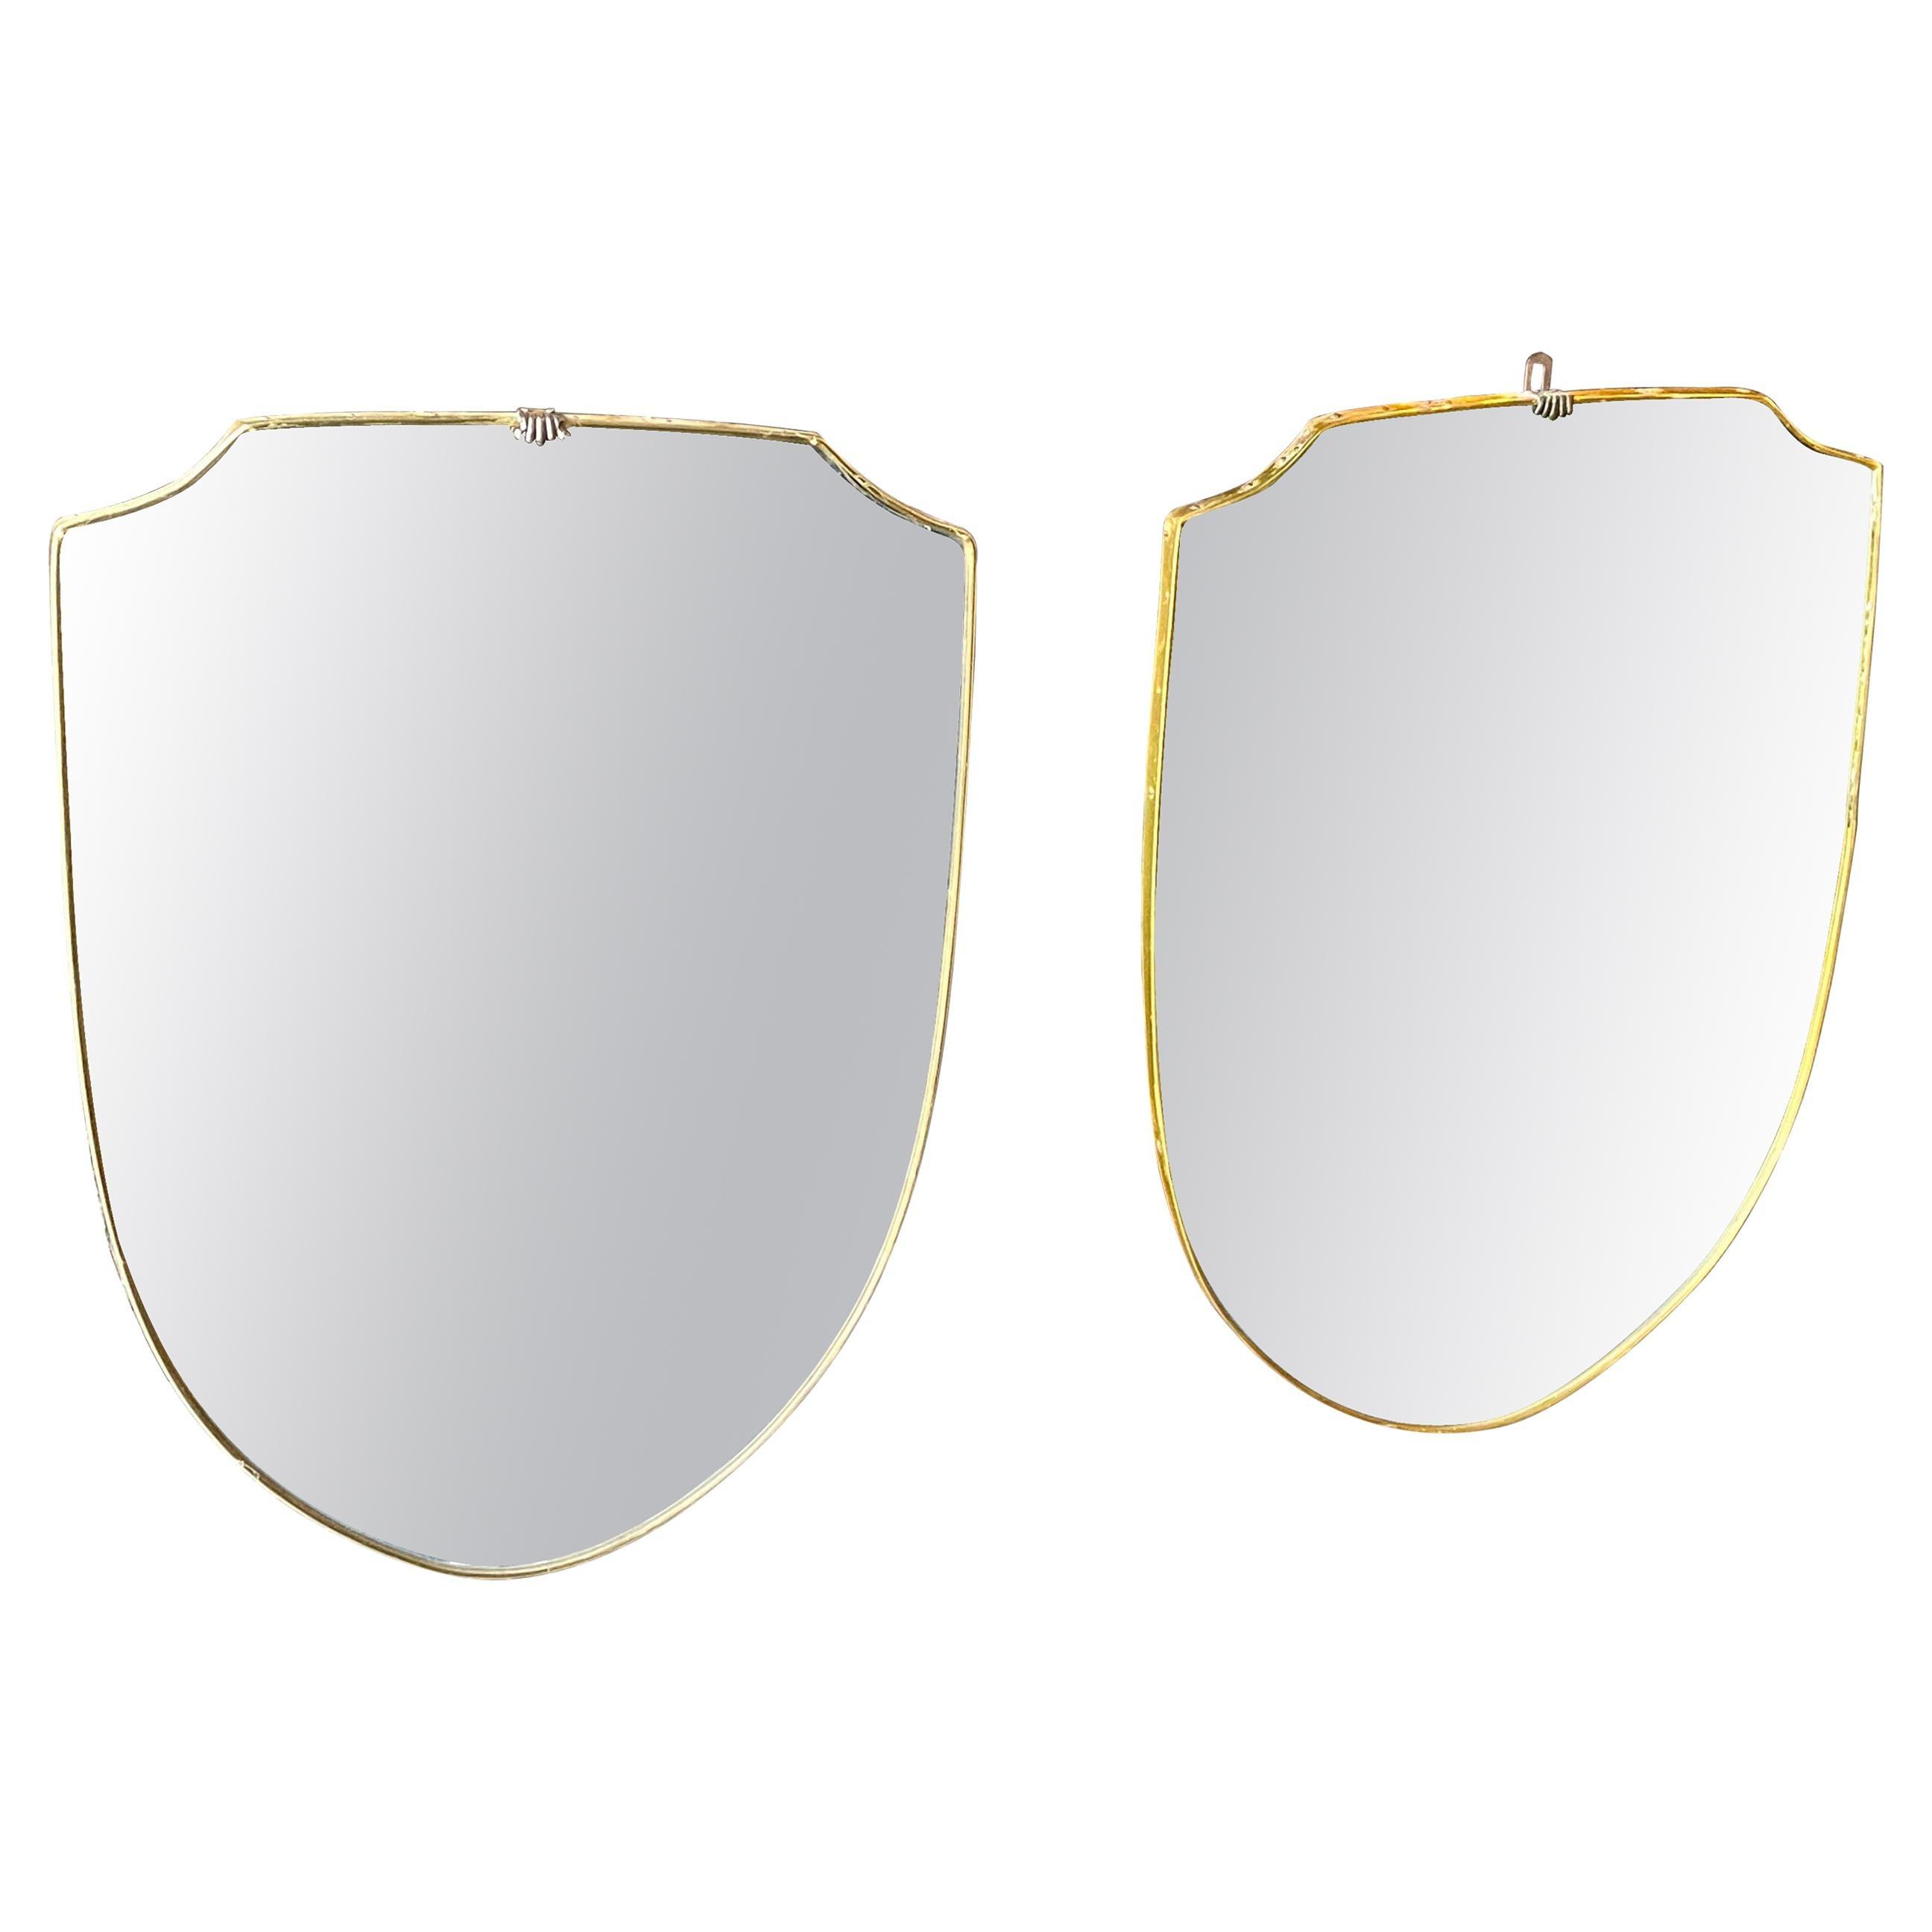 1950s Giò Ponti Style Set of Two Mid-Century Modern Italian Brass Wall Mirror